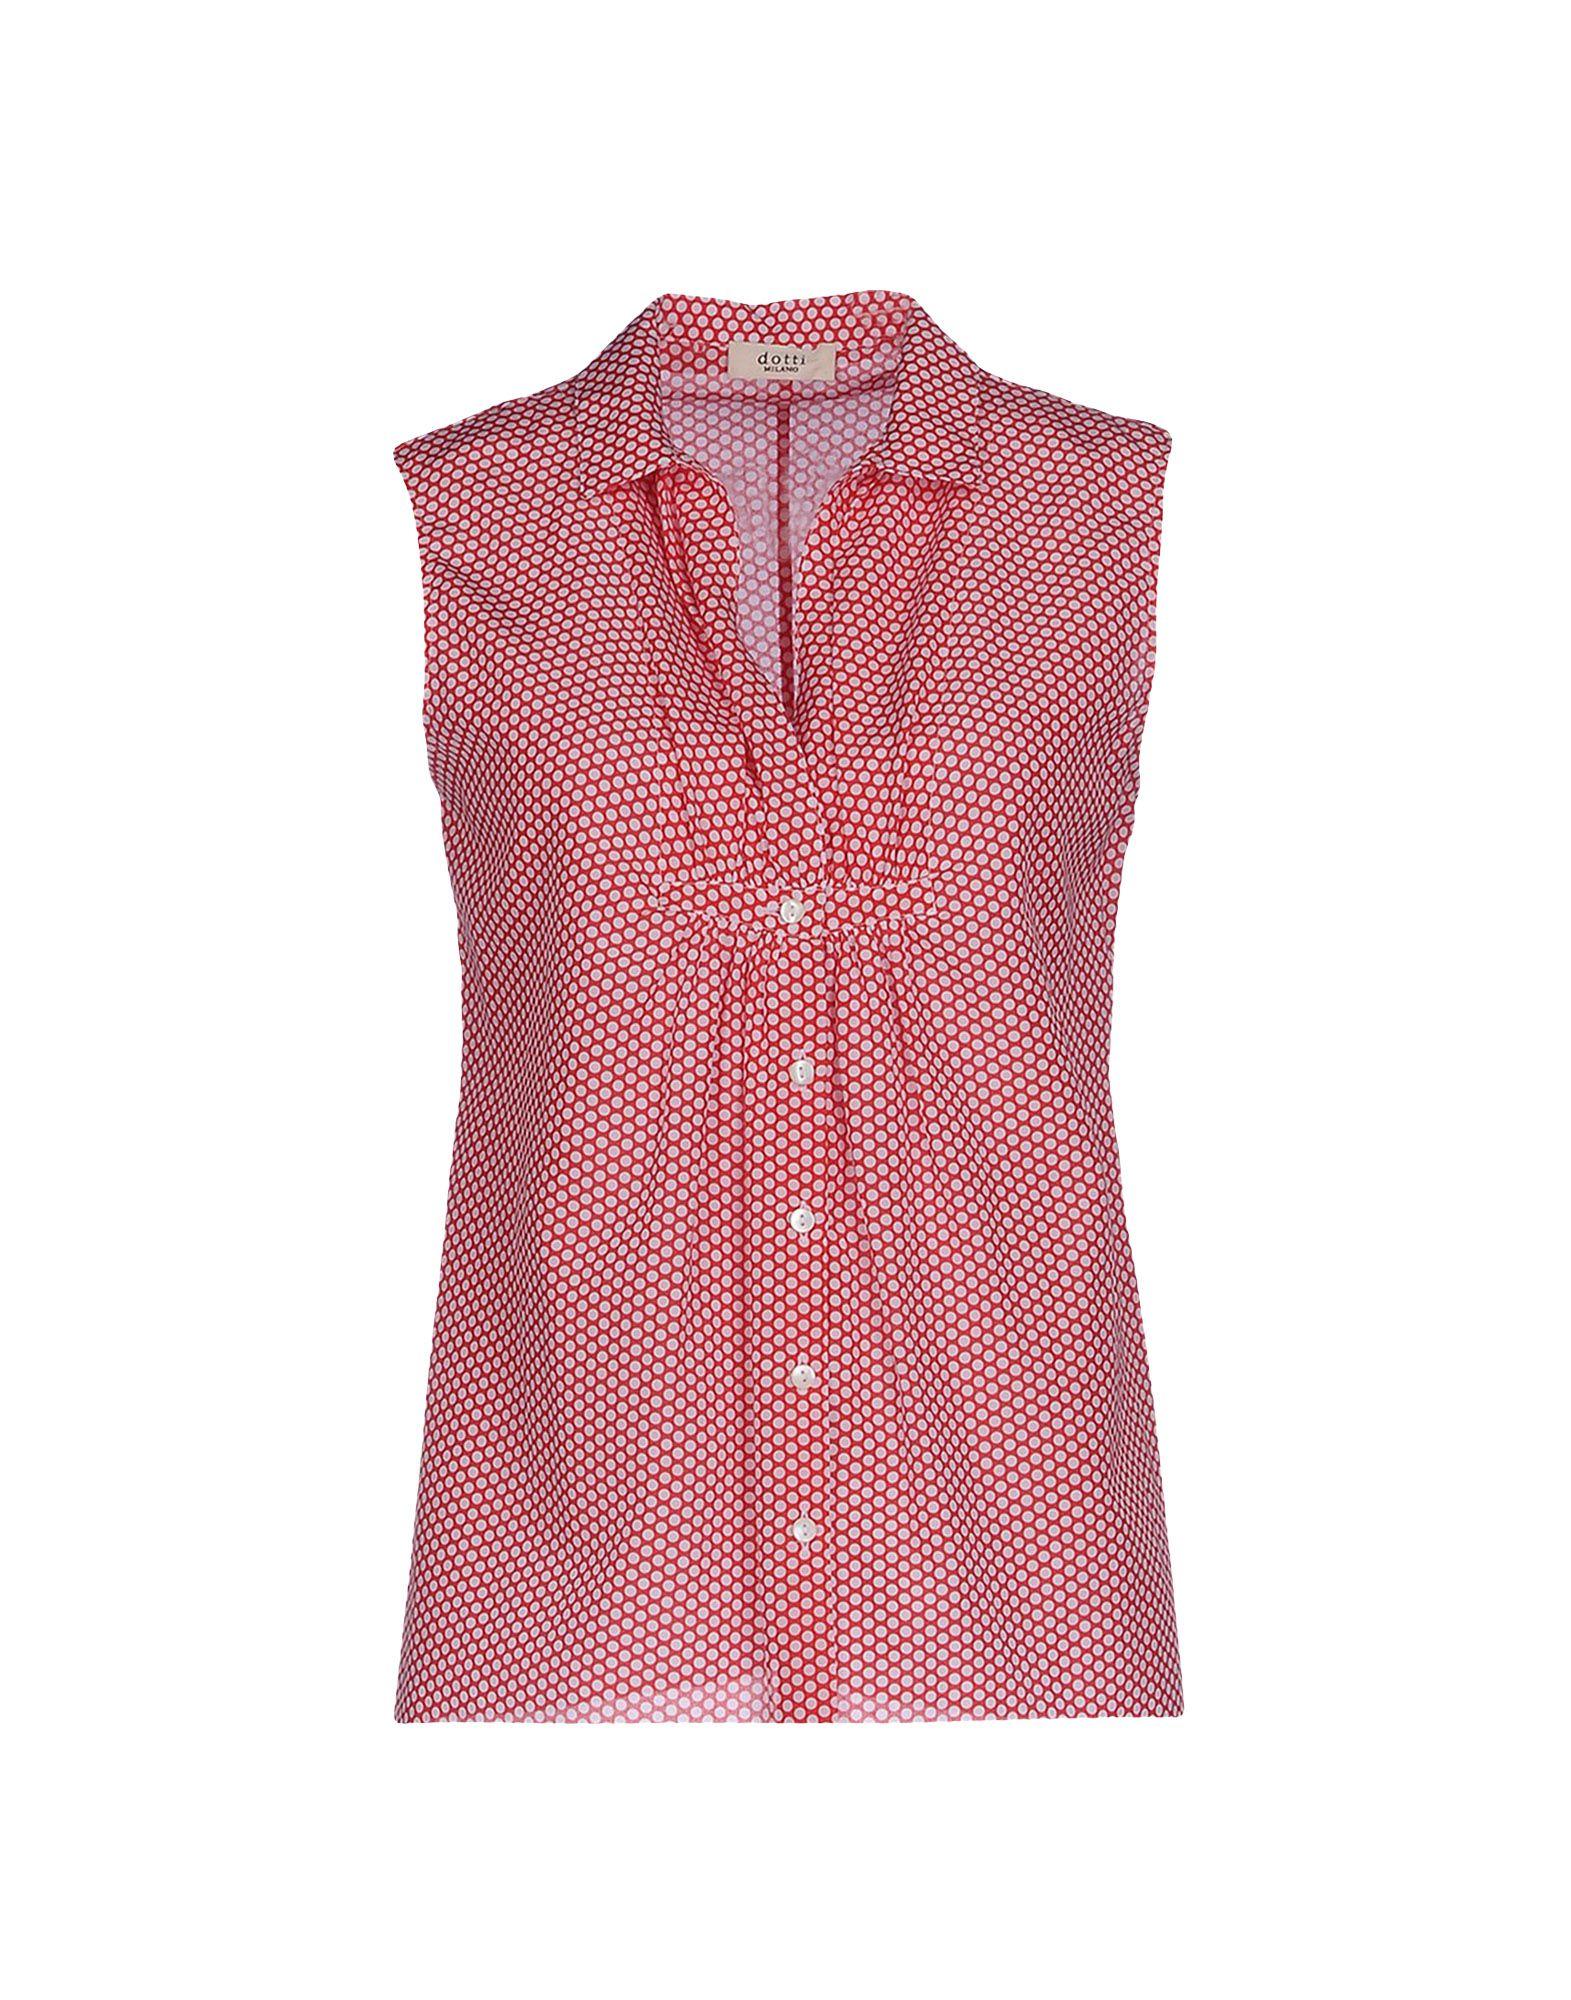 DITTA DOTTI MILANO Pубашка блуза xs milano блузы в горошек